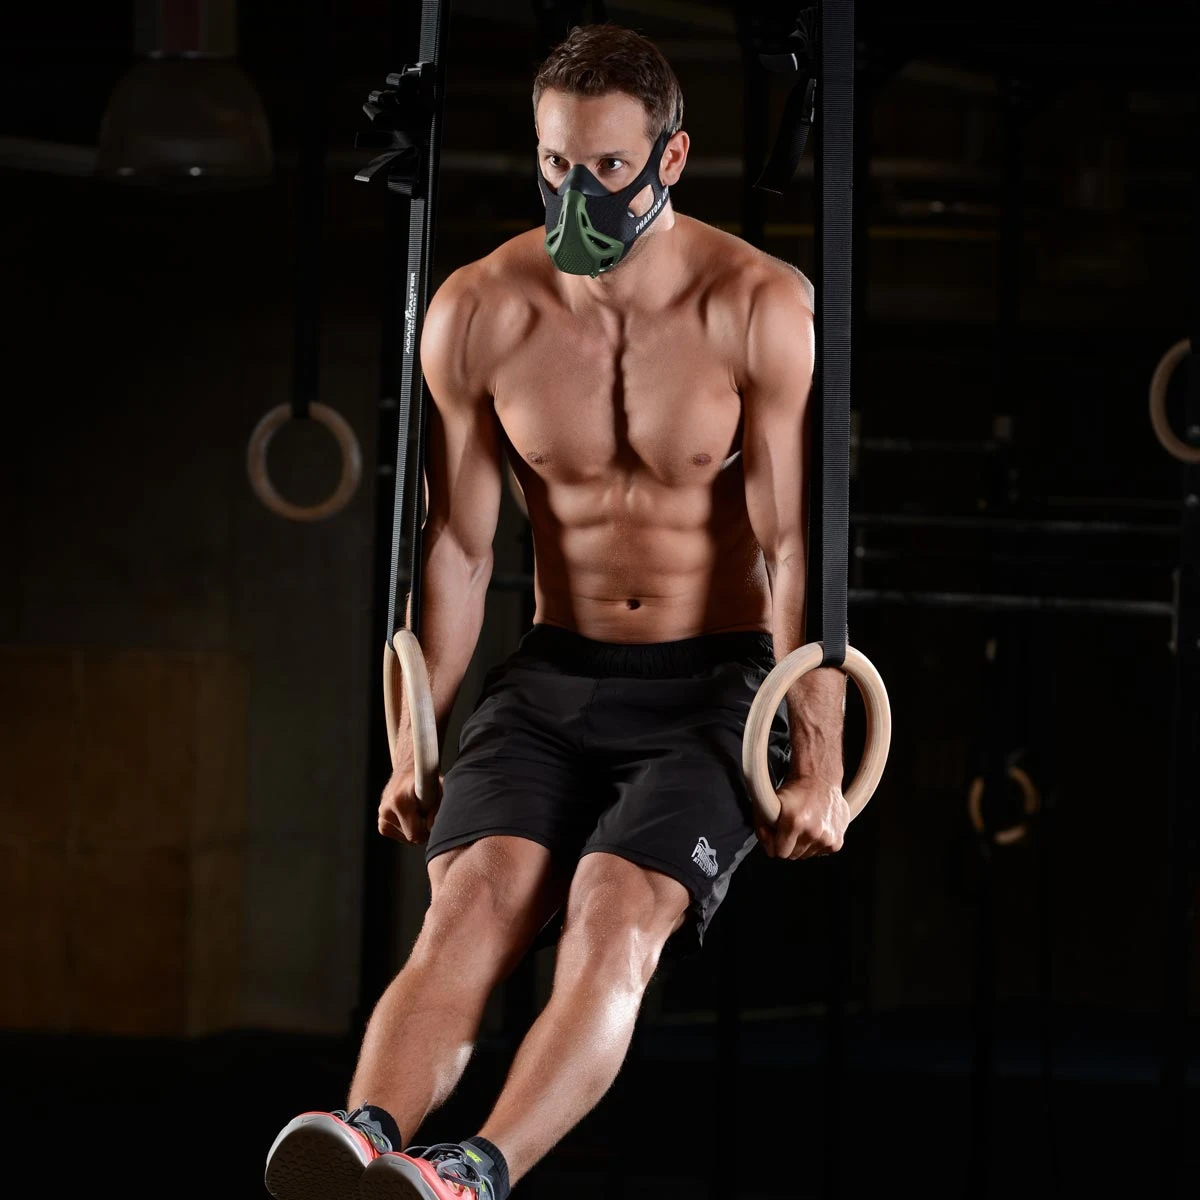 PHANTOM TRAININGSMASKE COVERAusdauer Kondition Training FitnessSILBER